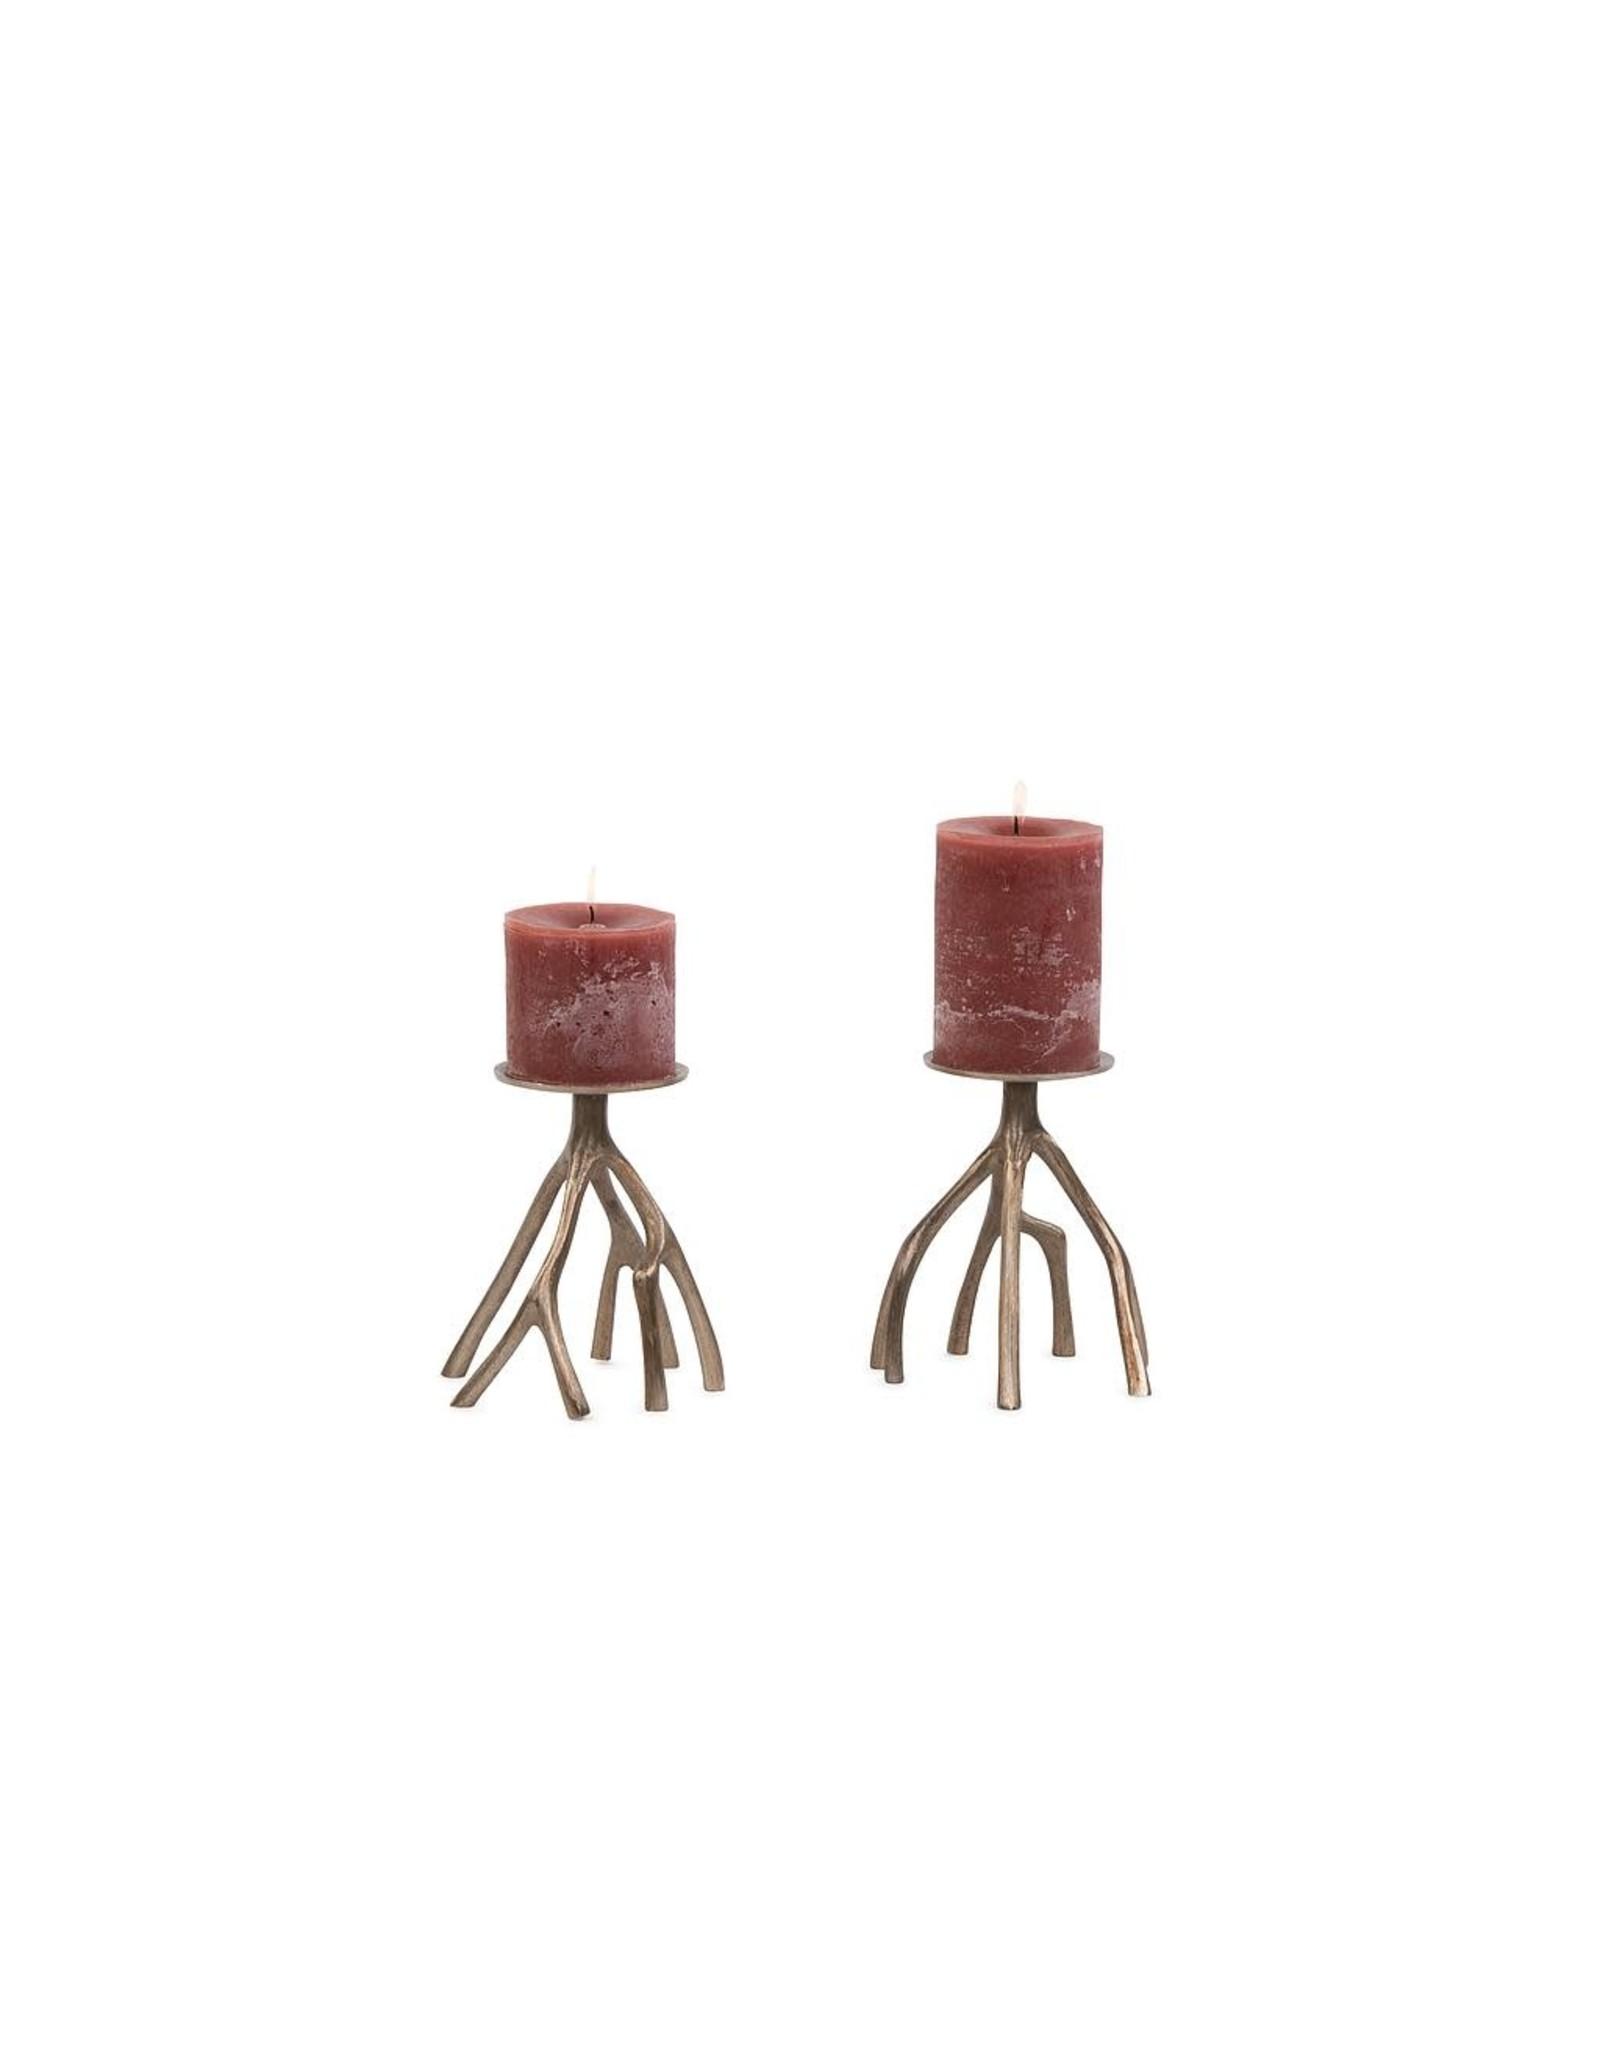 Dekocandle Organic Pillar Holder Aluminium - Bruched Gold - Medium